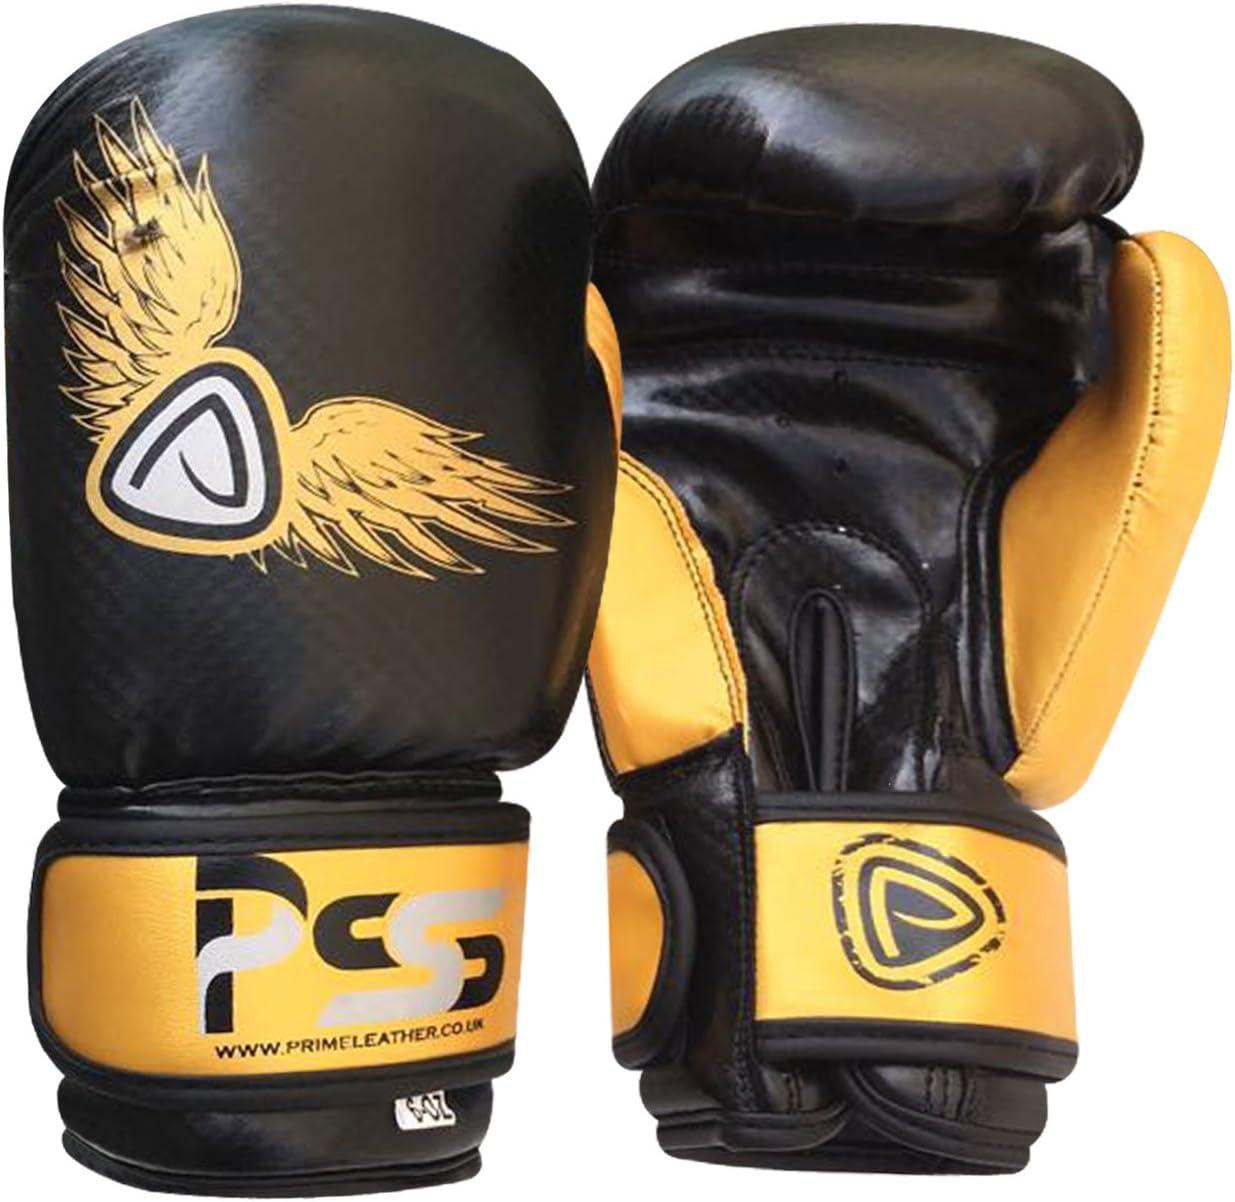 6oz//4oz Kids Boxing Gloves Rex Leather Hand Mad Muay Thai Kick Boxing Punching